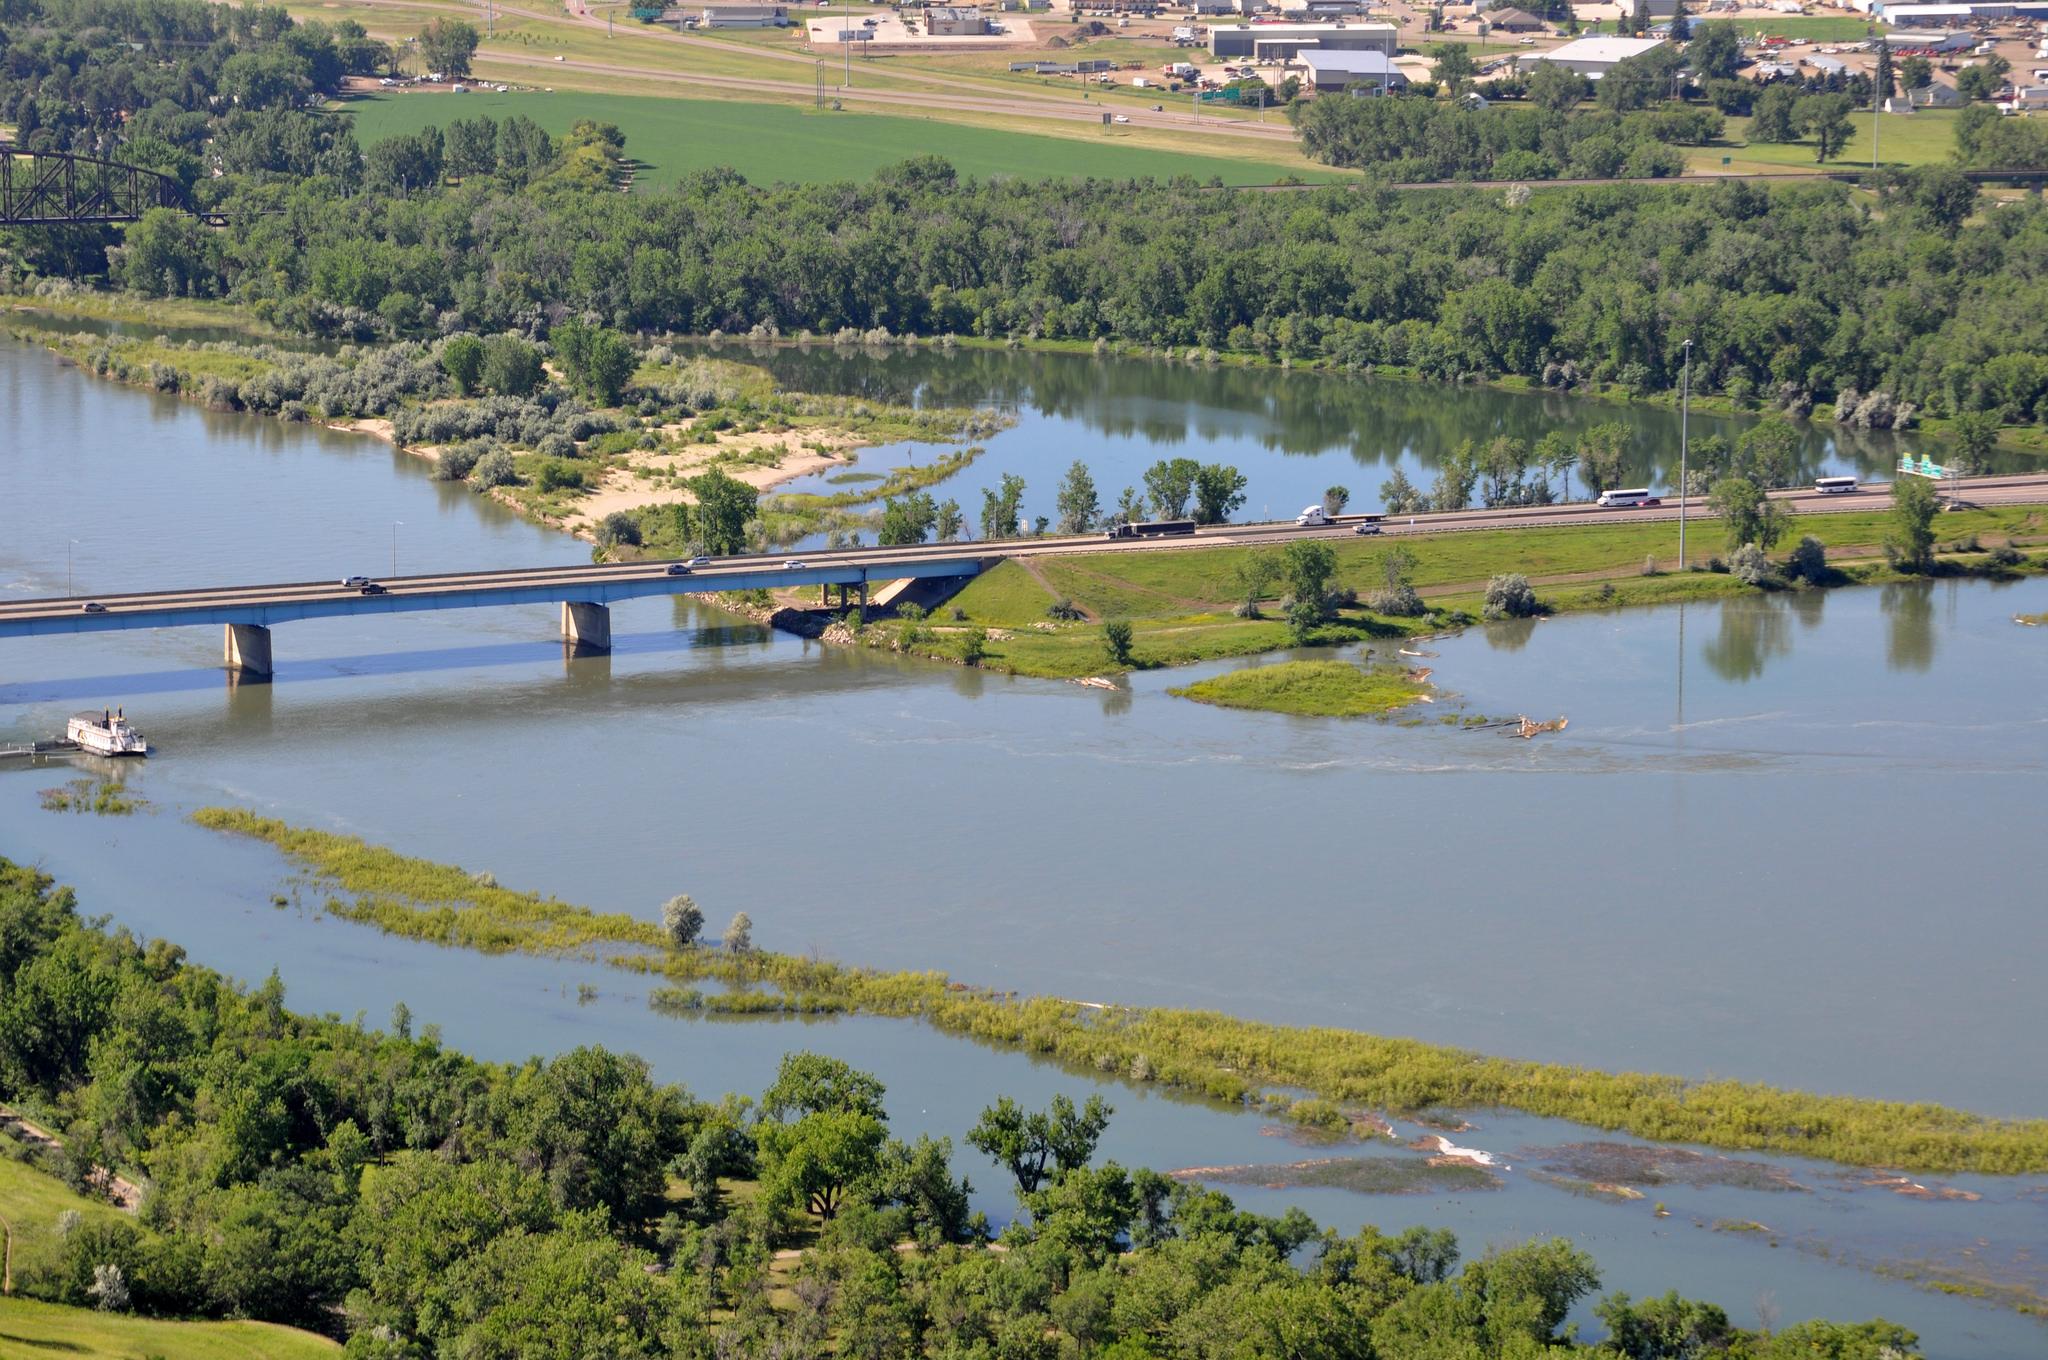 River in Bismarck_1530290605965.jpg.jpg